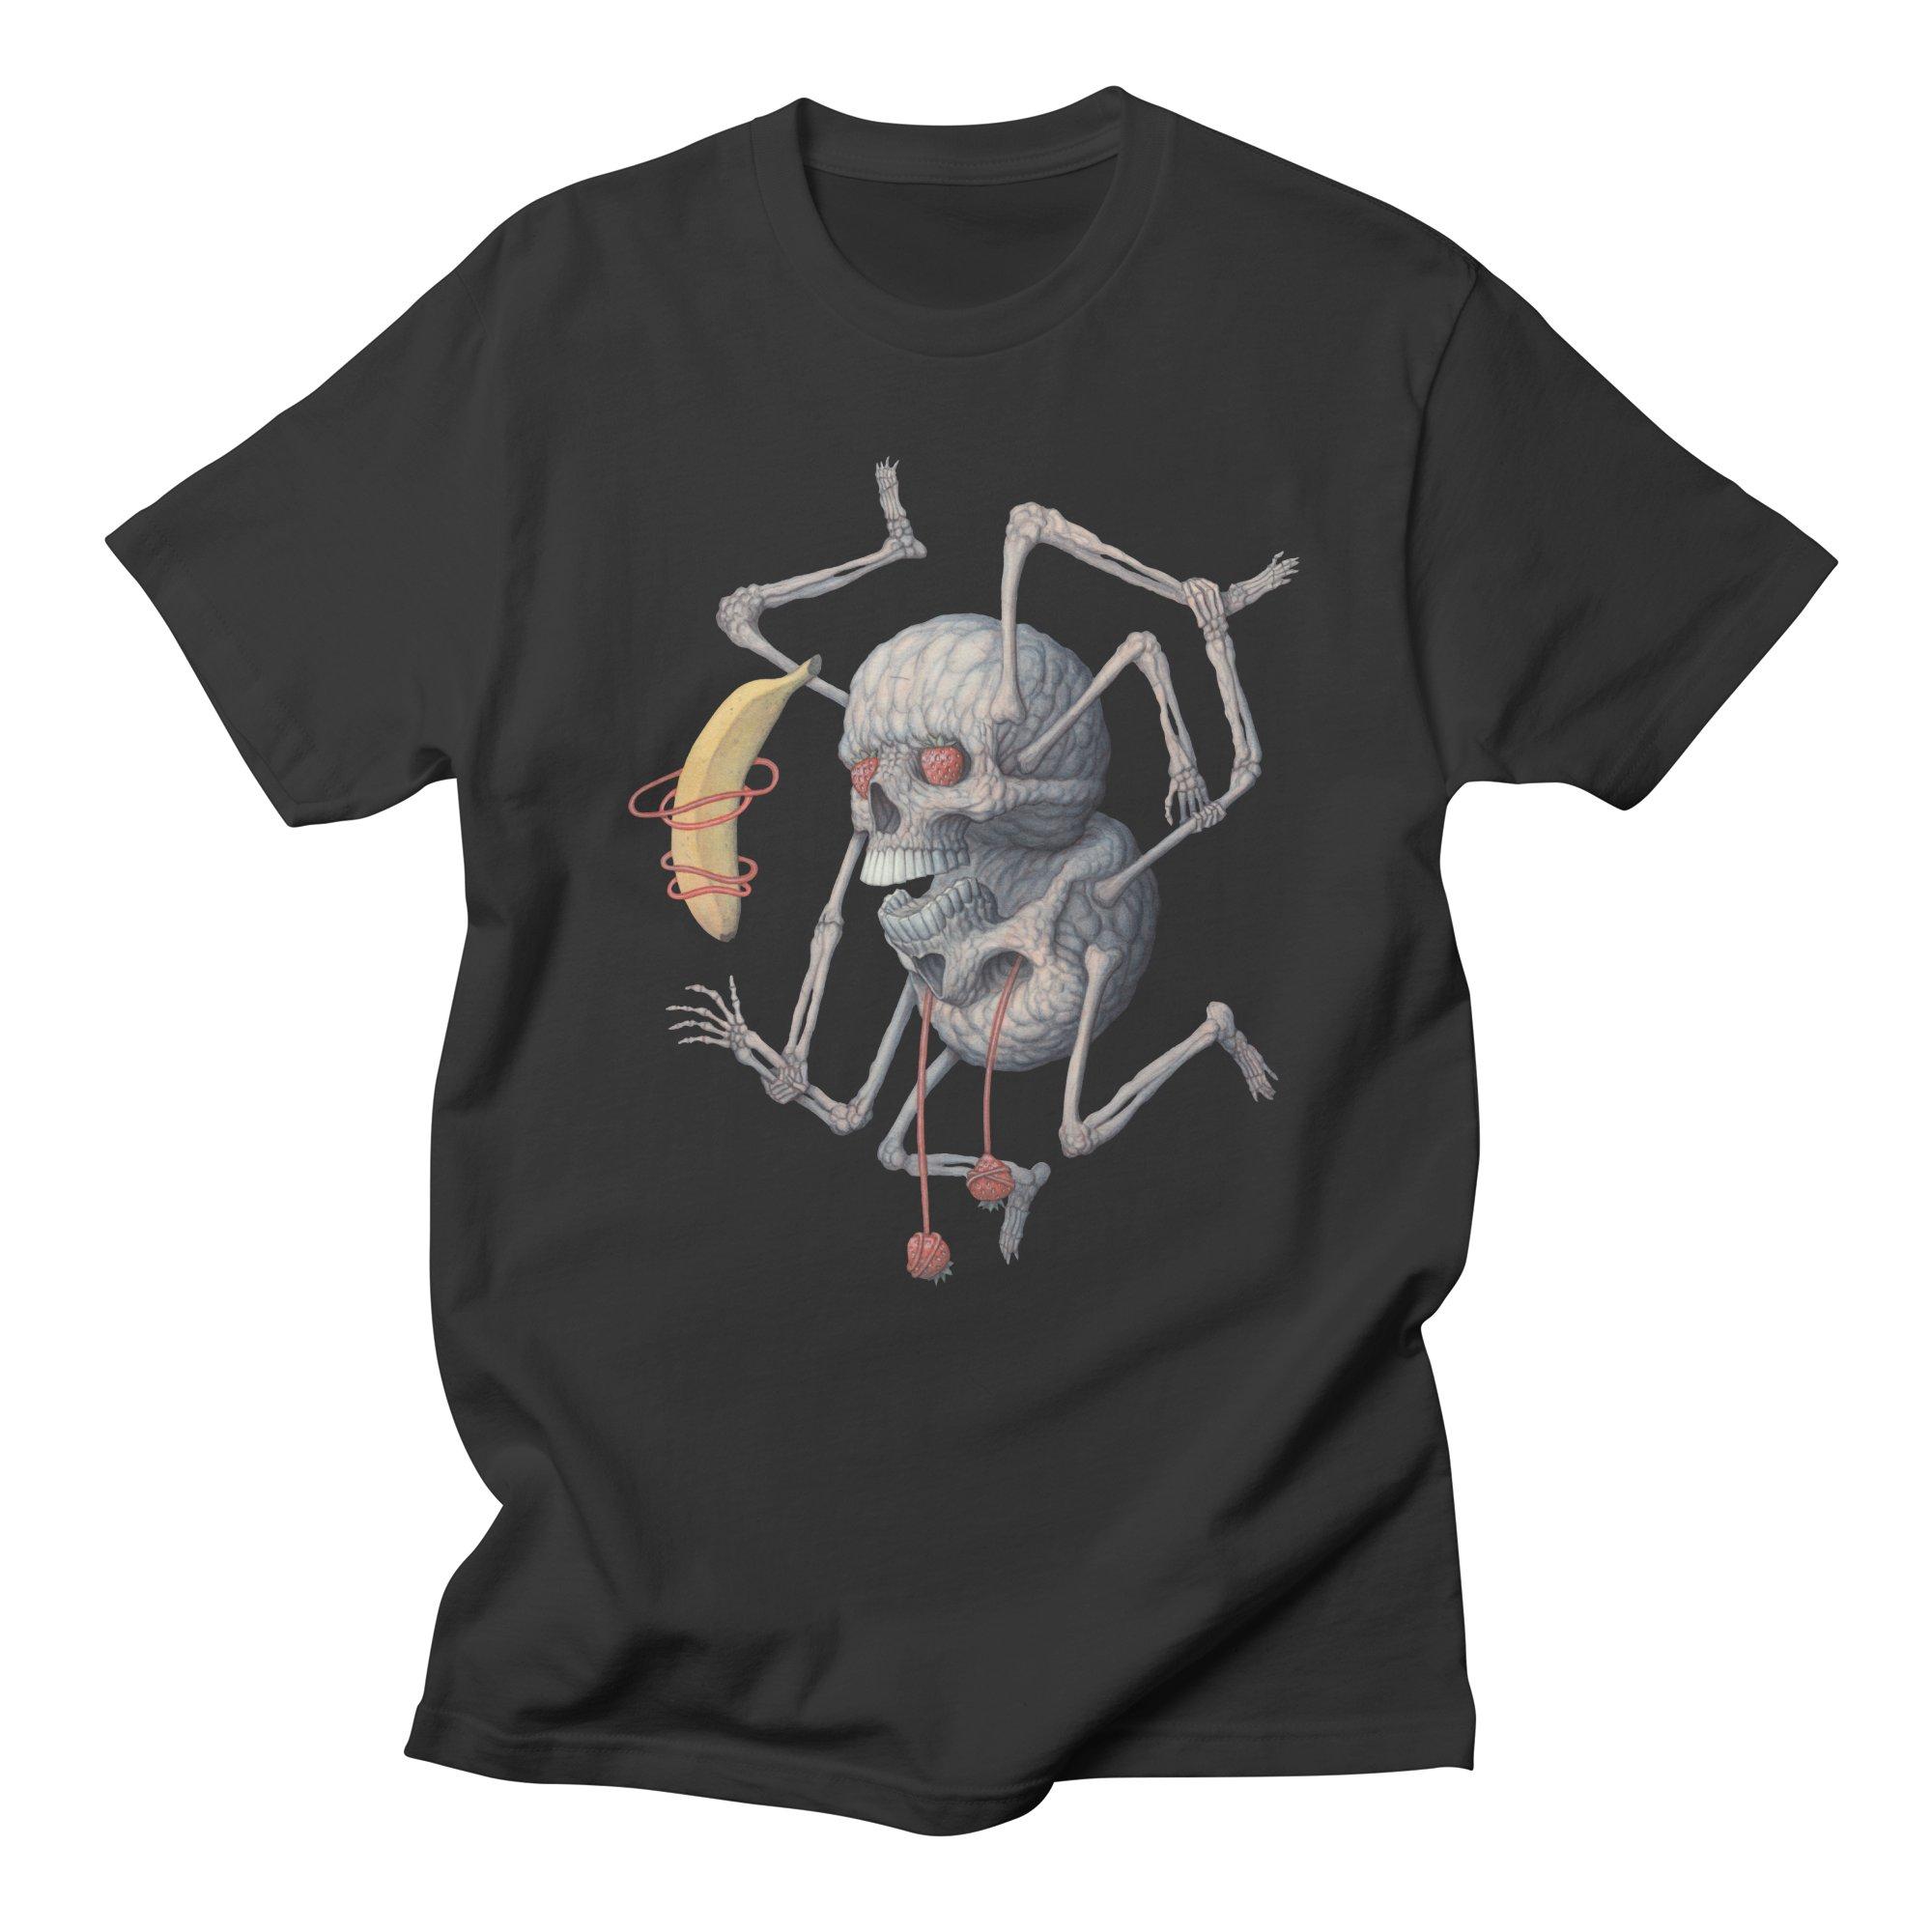 tshirt-design-by-nick-sheehy.jpg